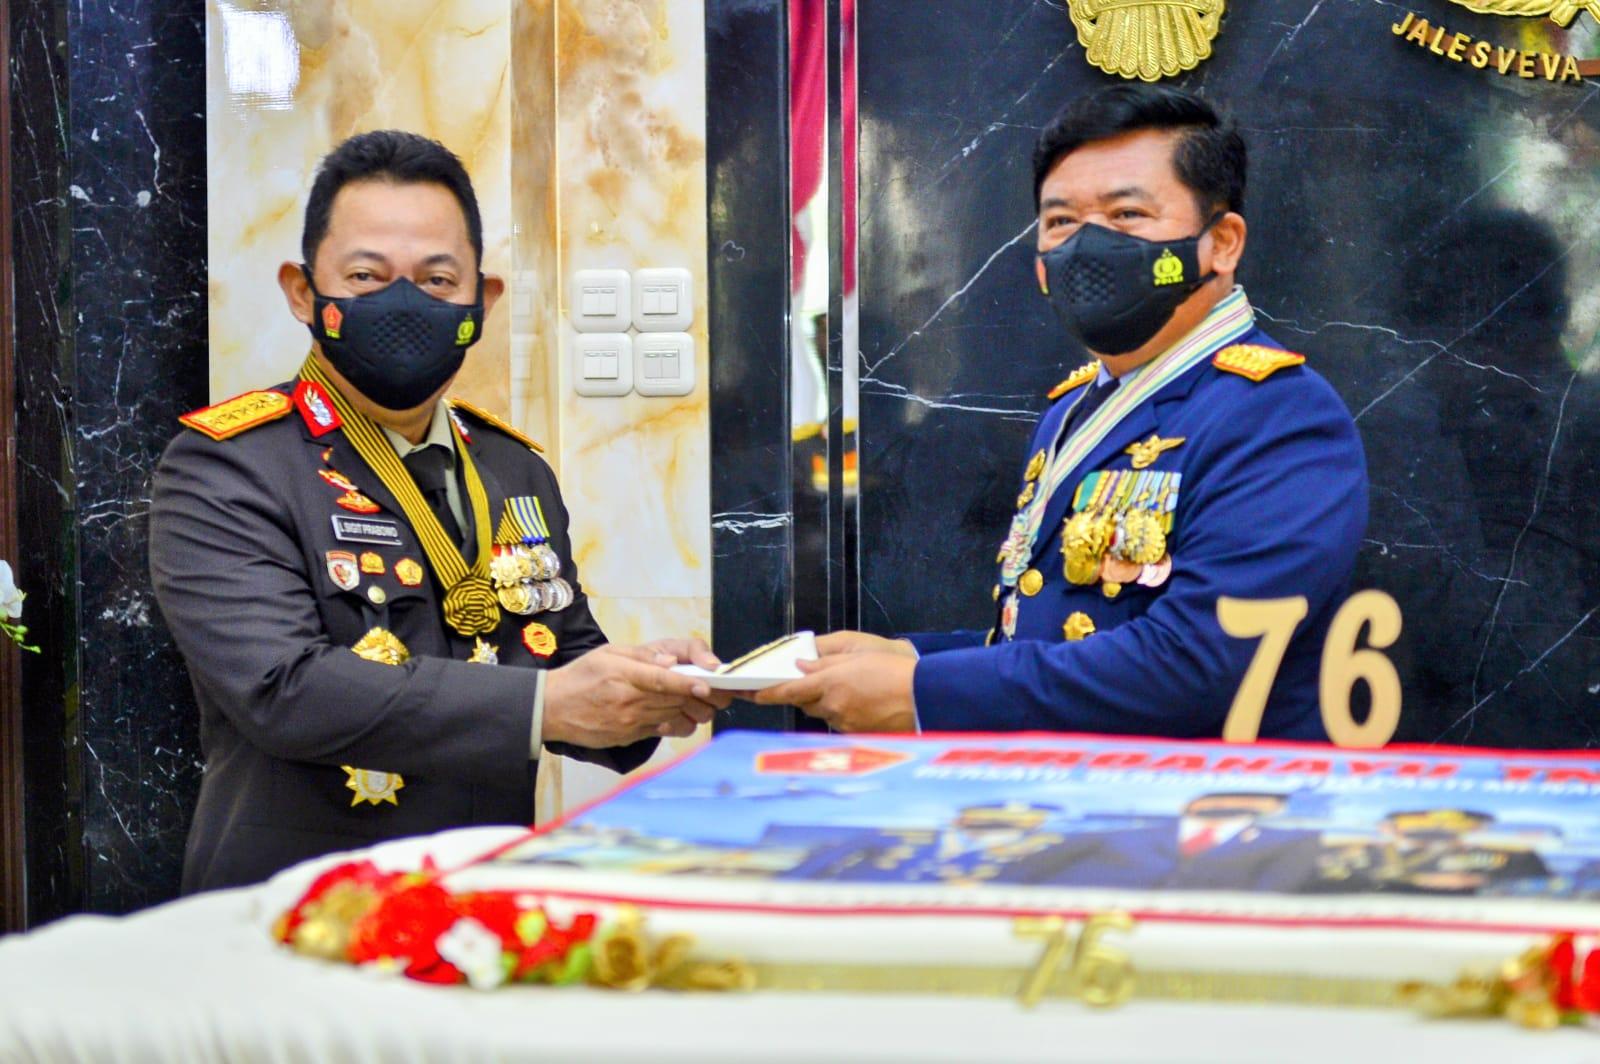 HUT ke-76 TNI, Kapolri: Sinergitas TNI-Polri Kunci Menghadapi Segala Bentuk Tantangan ataupun Ancaman